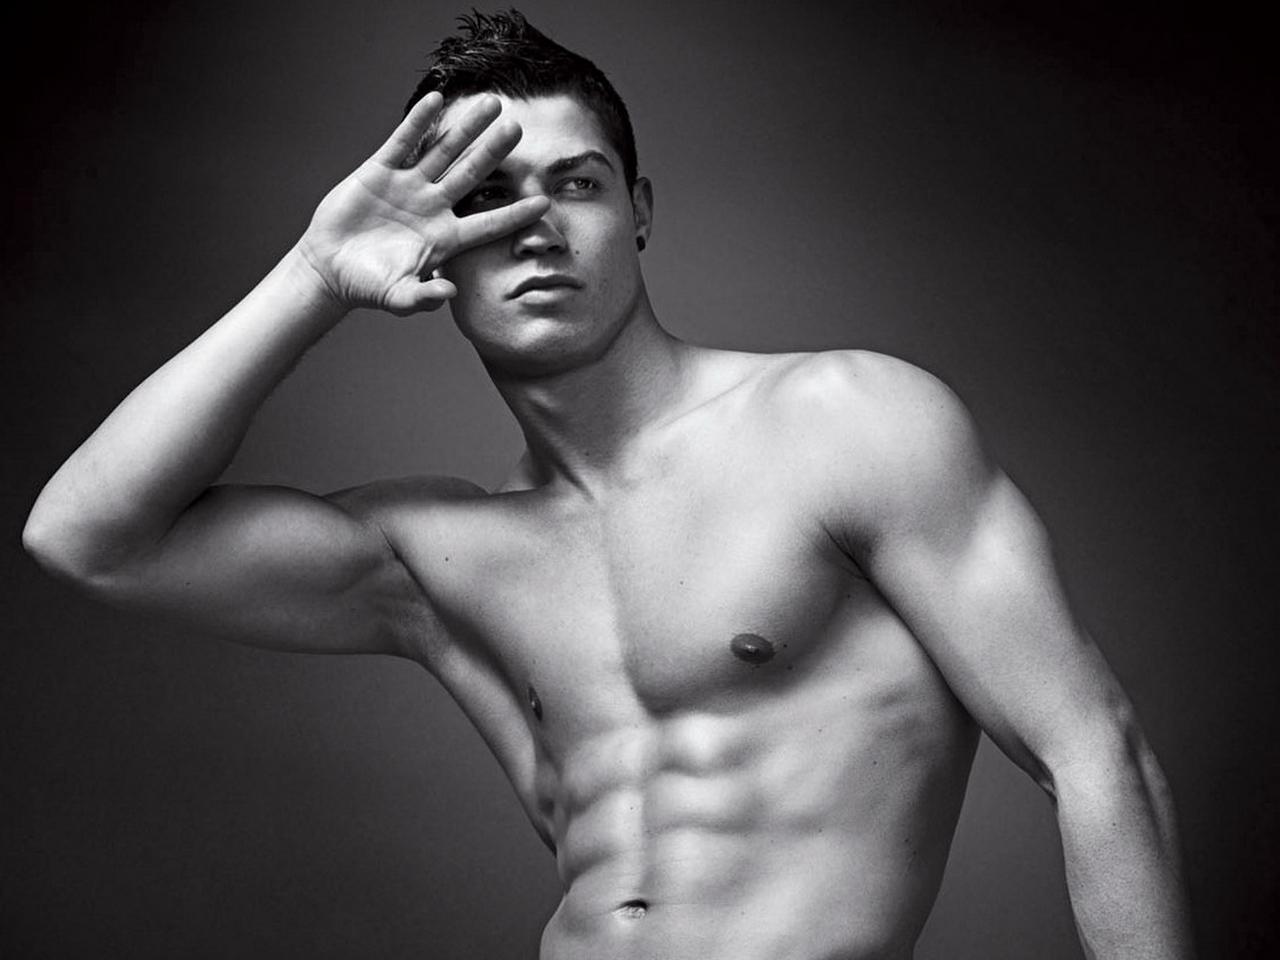 http://4.bp.blogspot.com/--eHeXiwUD10/T7jTrLK-5QI/AAAAAAAAKDc/_DJrUulNjq8/s1600/Cristiano-Ronaldo+5.jpg